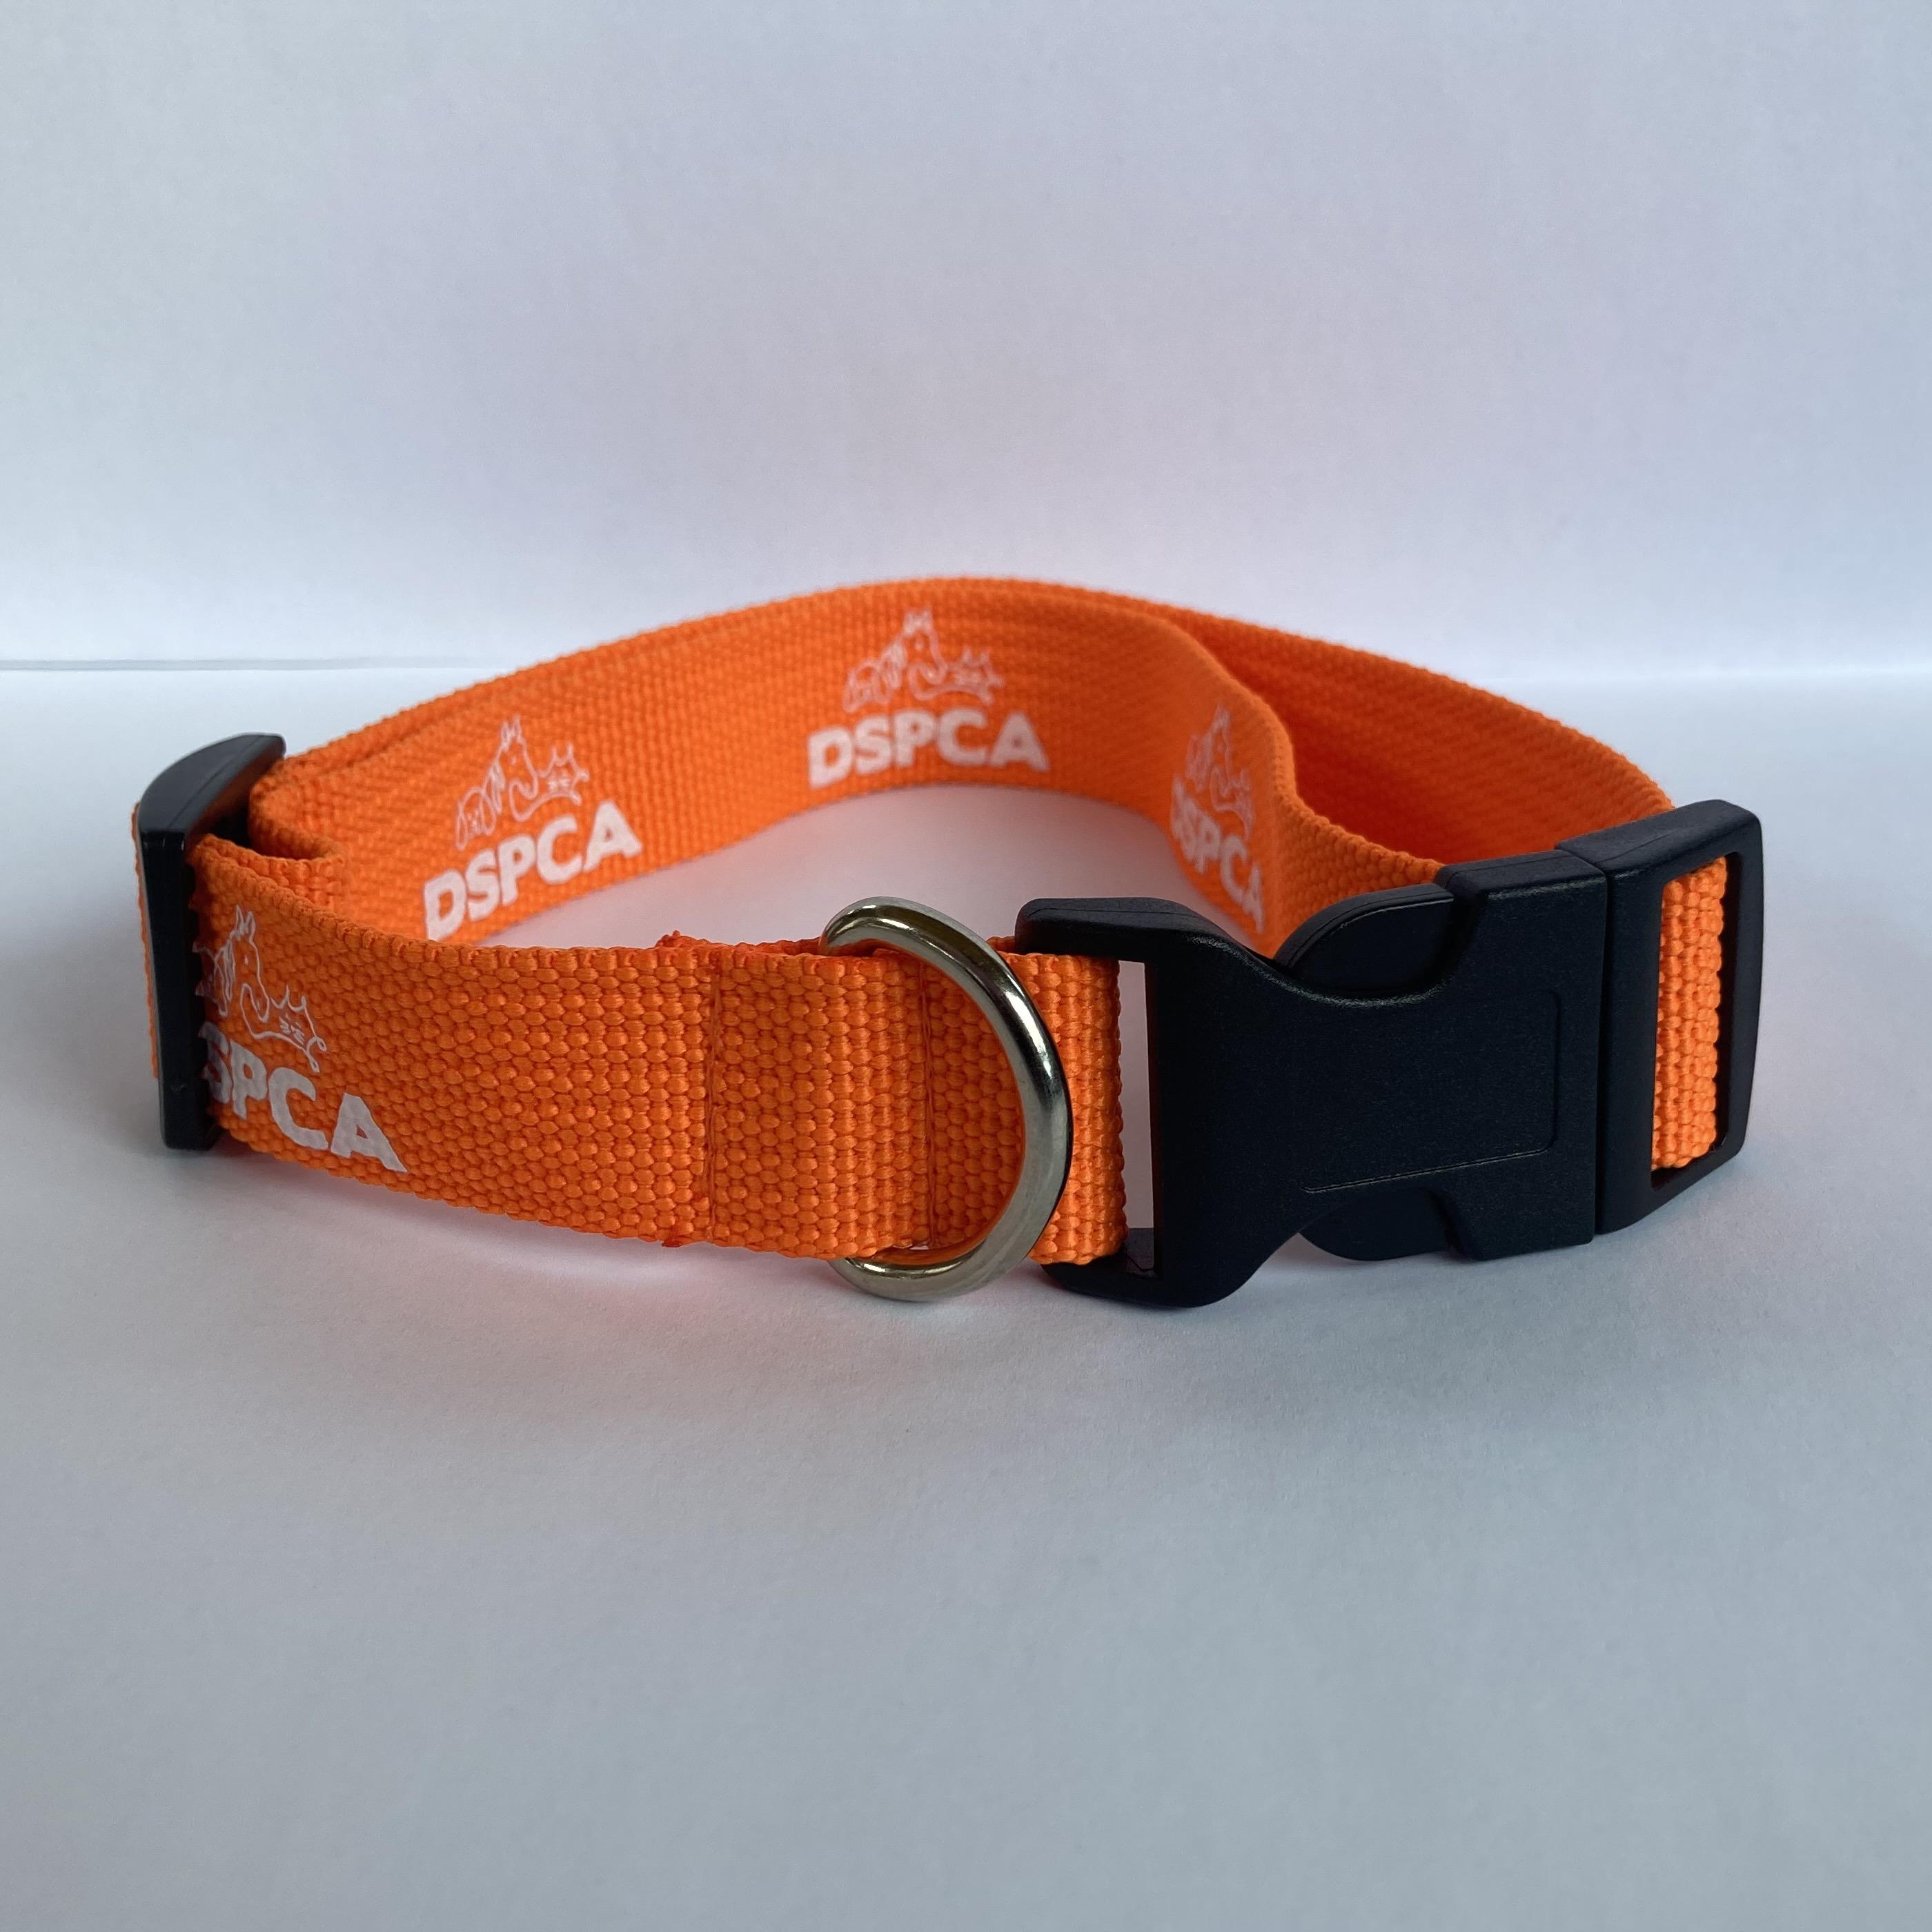 DSPCA Adjustable Dog Collar